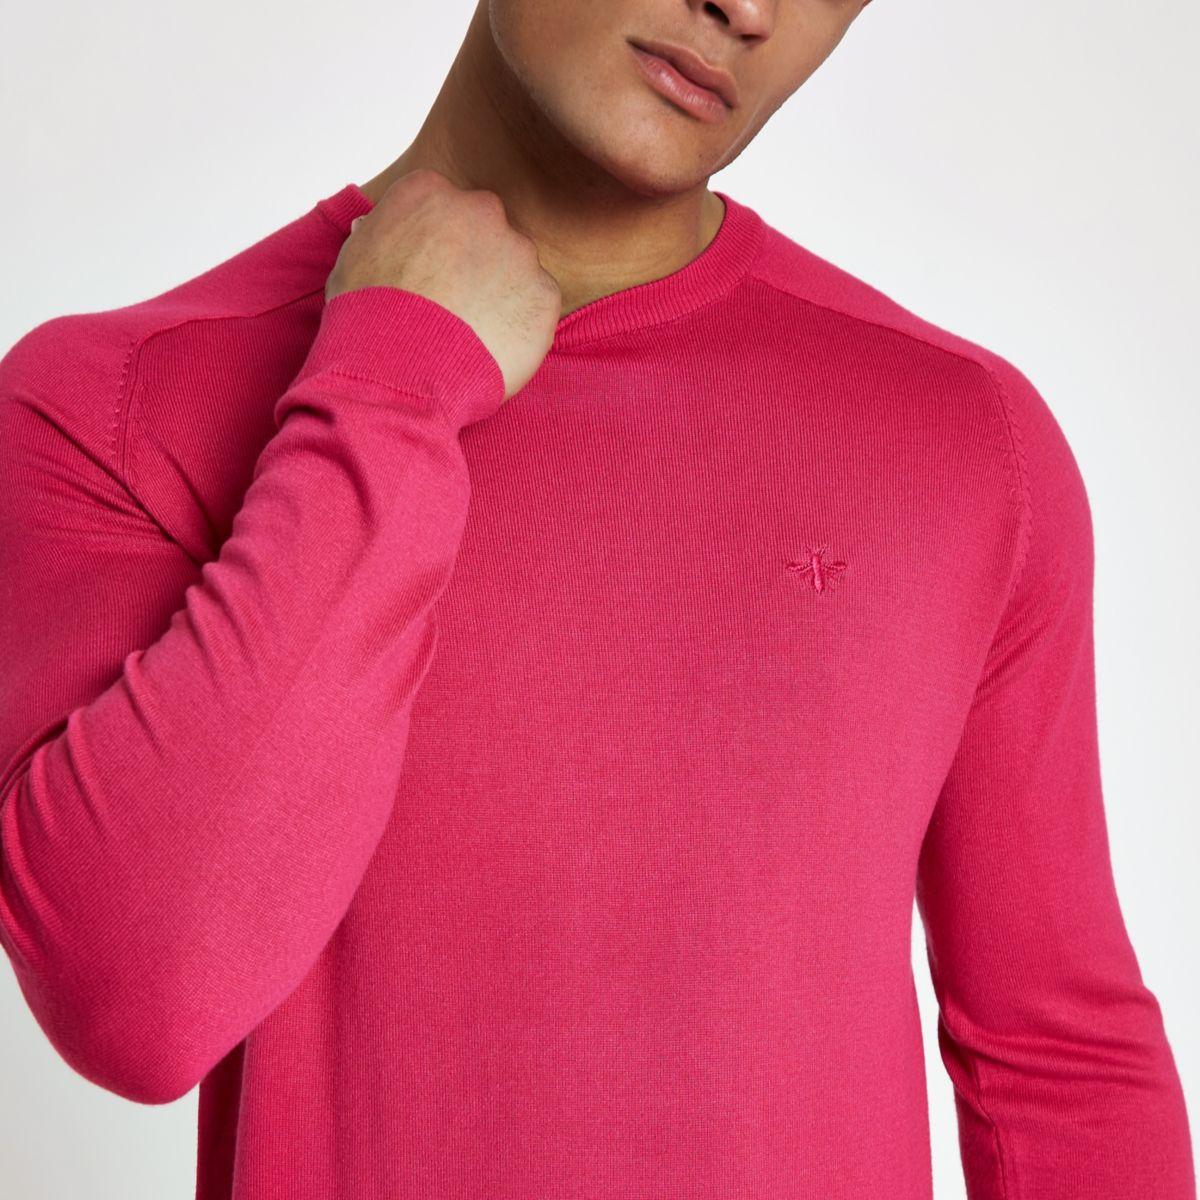 Bright pink slim fit crew neck jumper